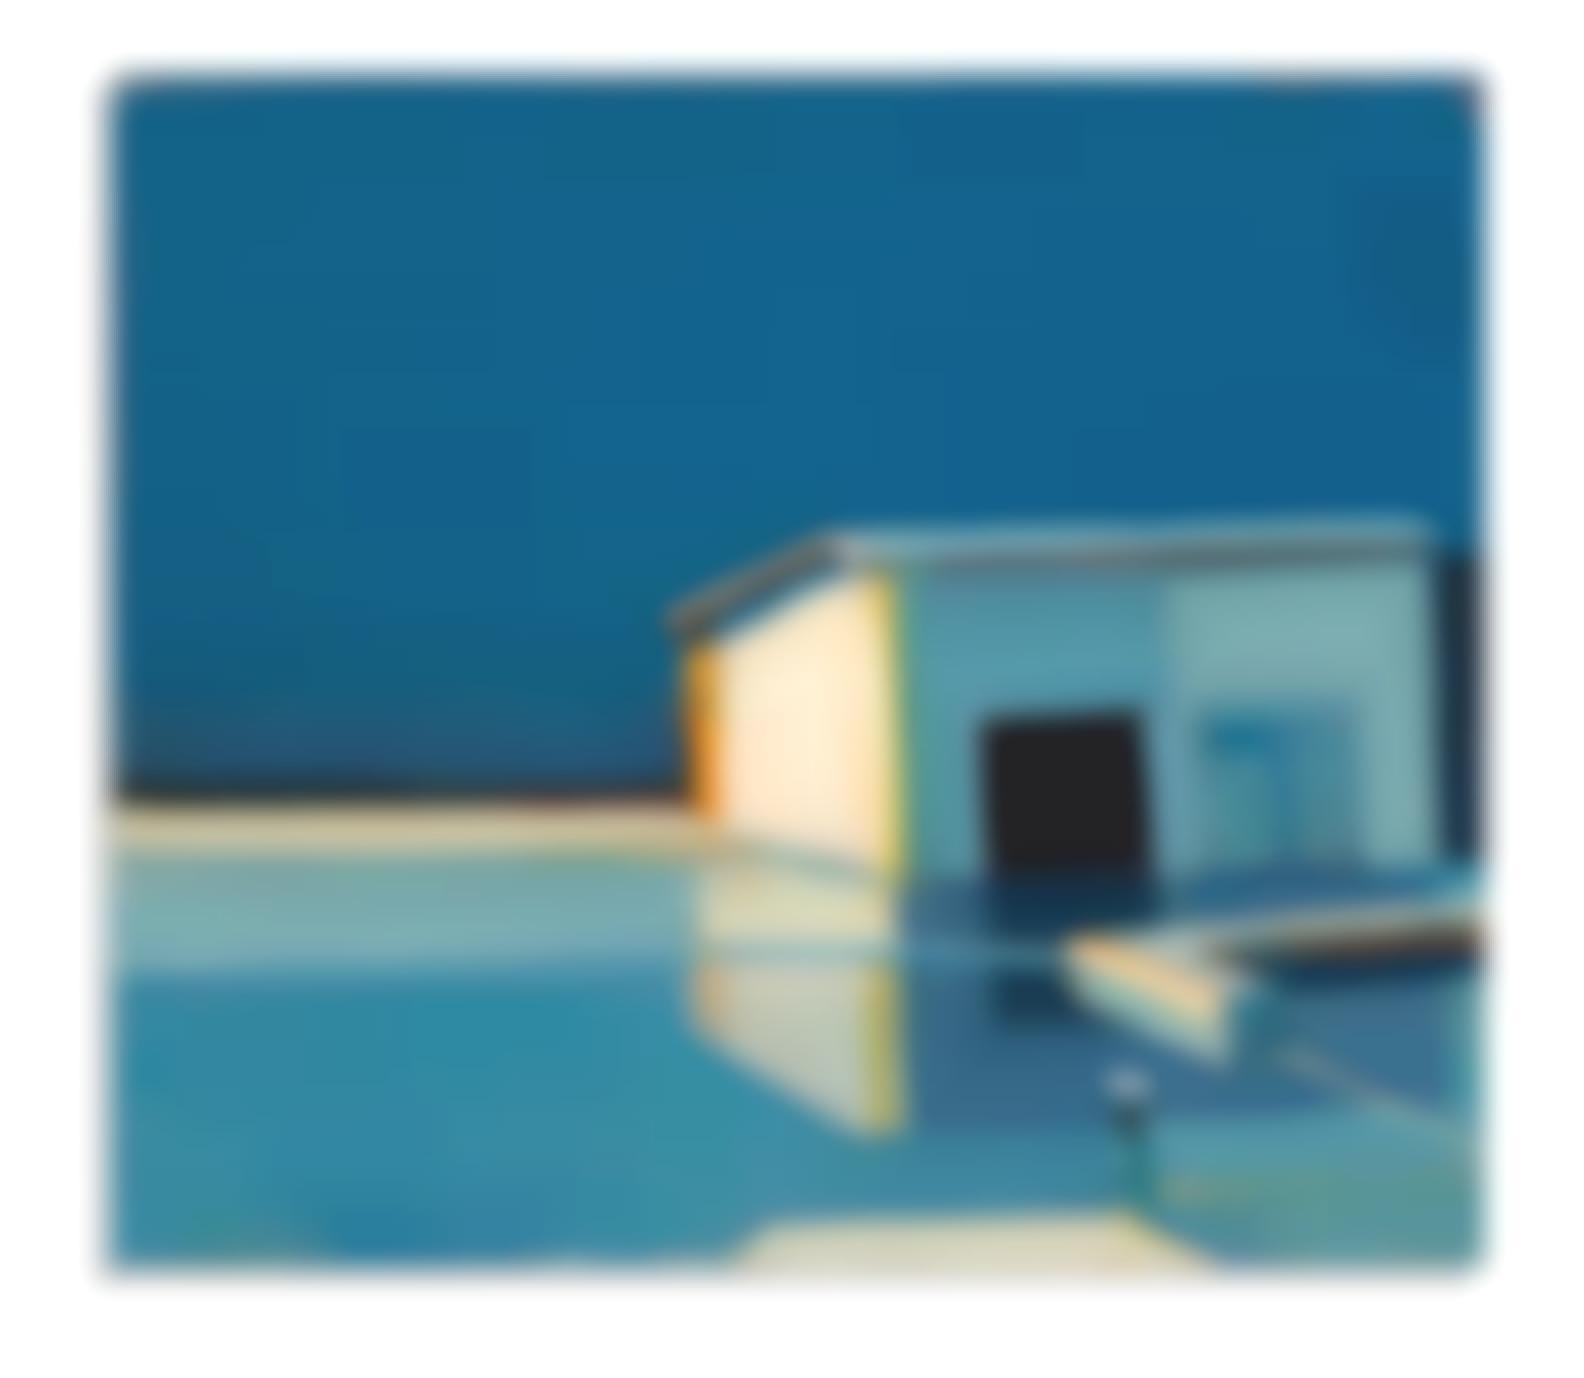 Raimonds Staprans-Boat House In Blue-1999